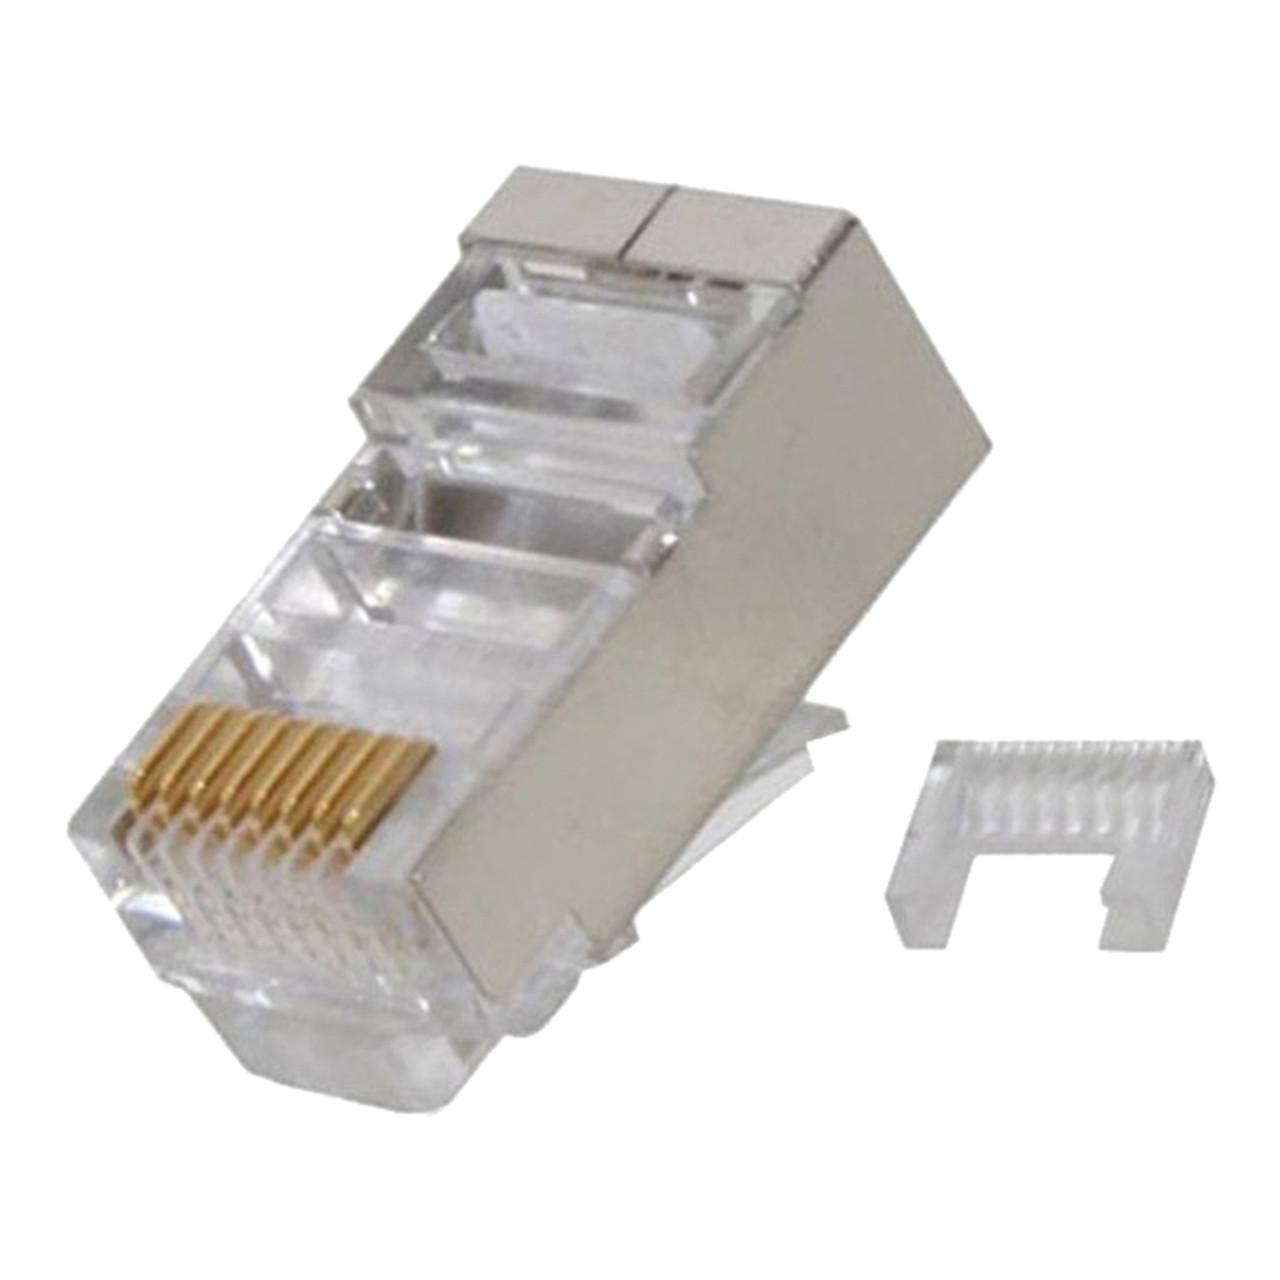 medium resolution of quest nmp 8825 modular plugs 100 pack cat6 rj45 shielded 8p8c